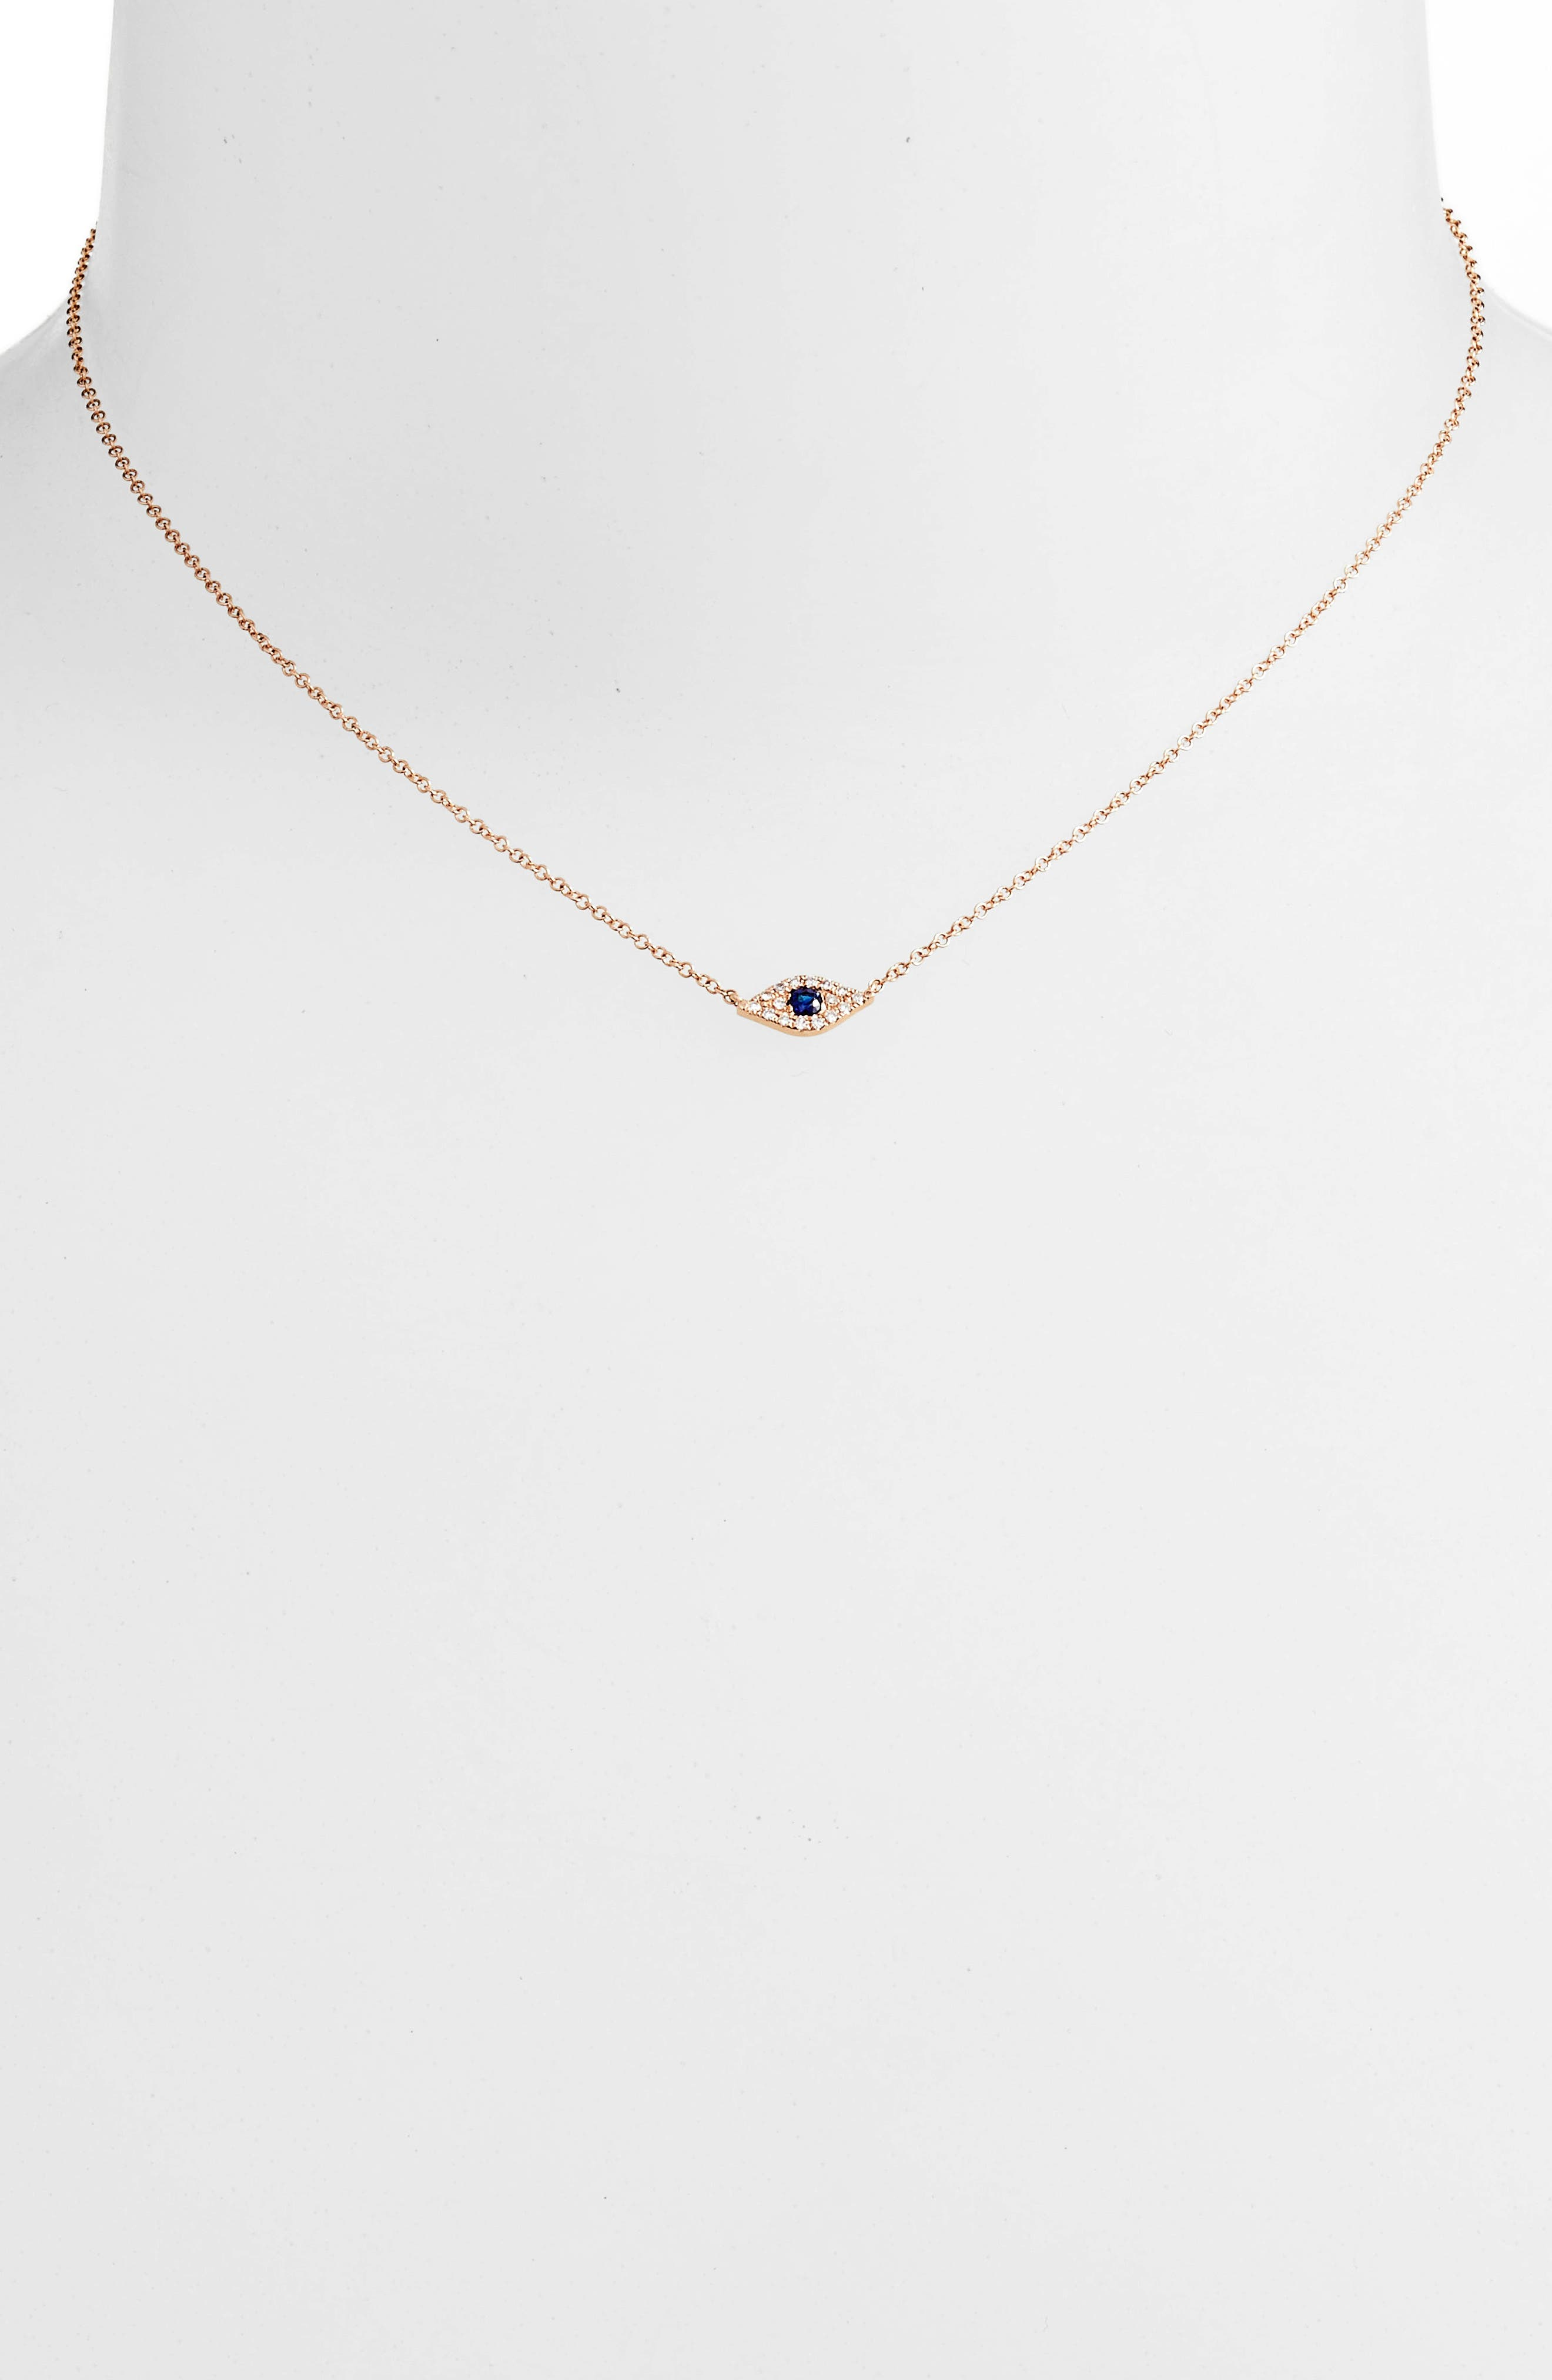 Evil Eye Diamond & Sapphire Pendant Necklace,                             Alternate thumbnail 2, color,                             ROSE GOLD